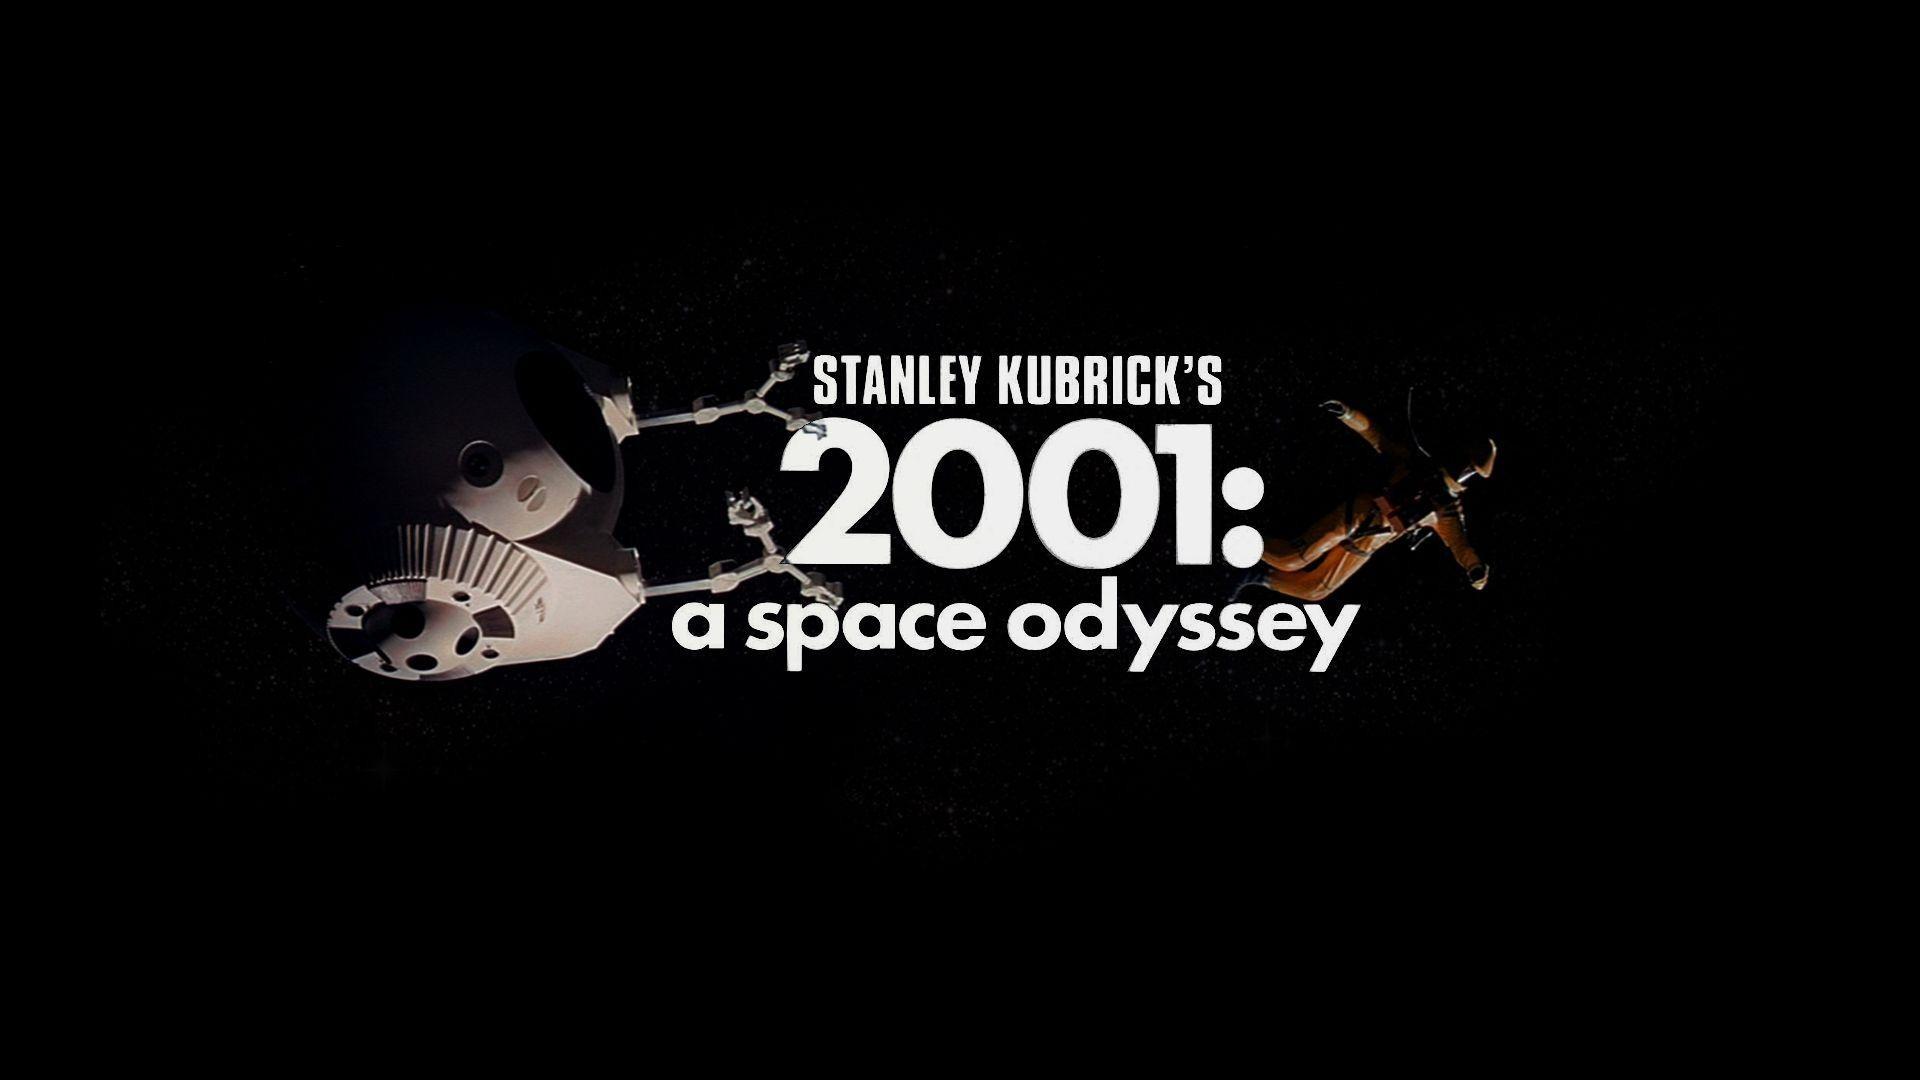 Stanley Kubrick Wallpaper Wallpapertag